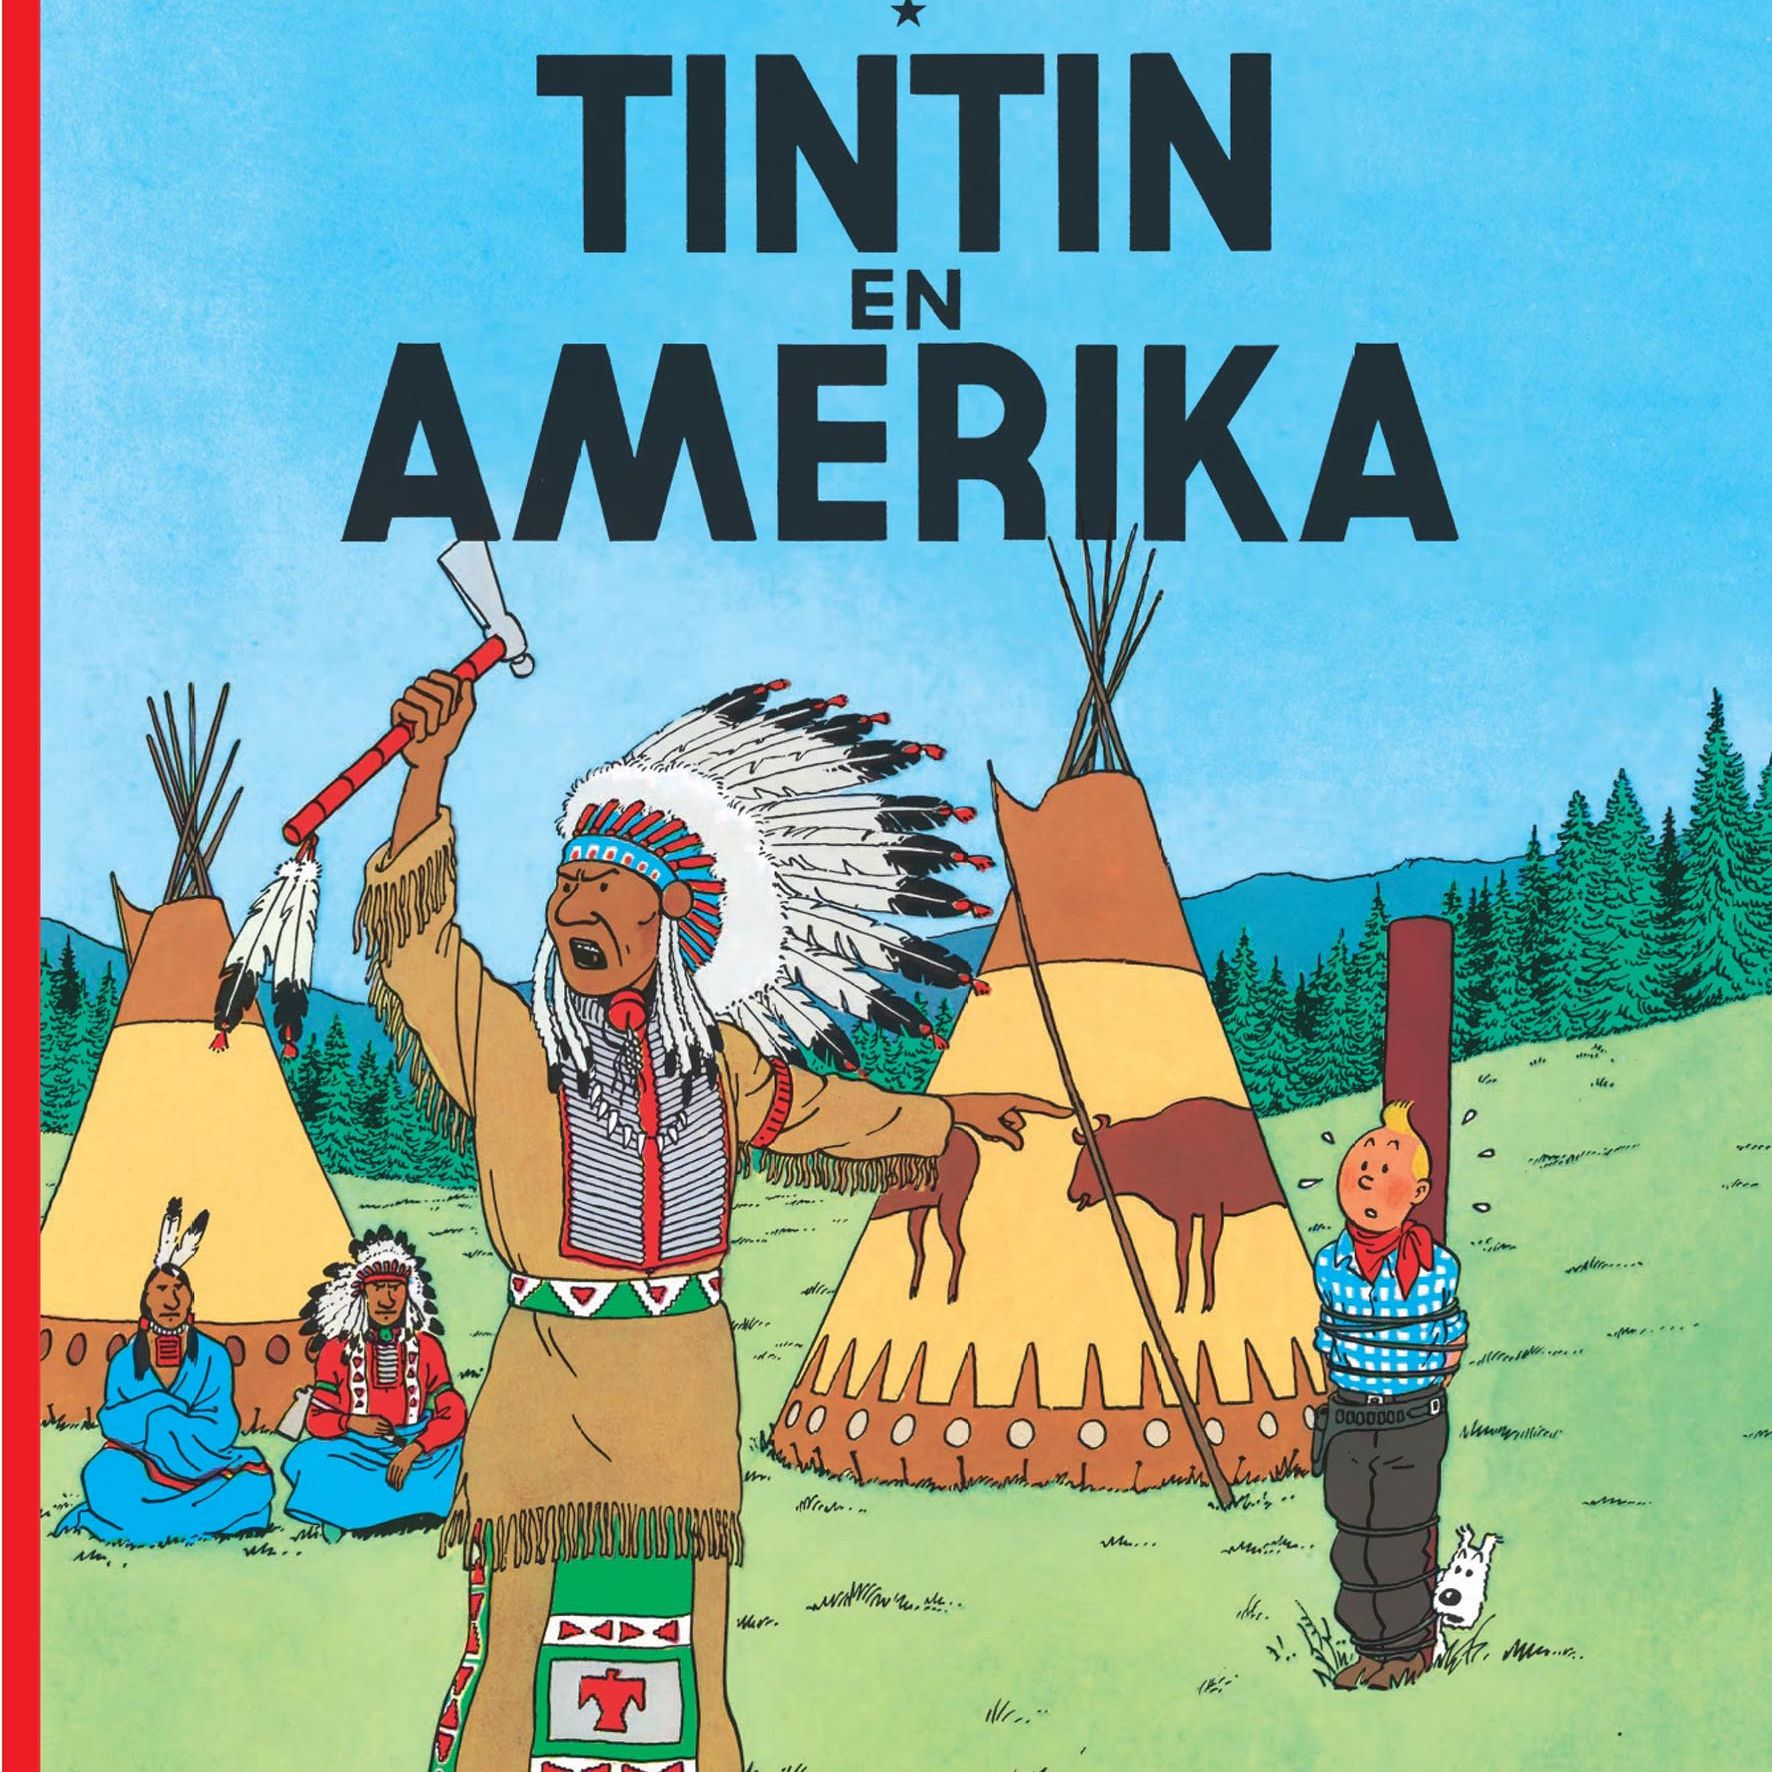 Un nouvel album de Tintin traduit en breton sort mercredi en librairie